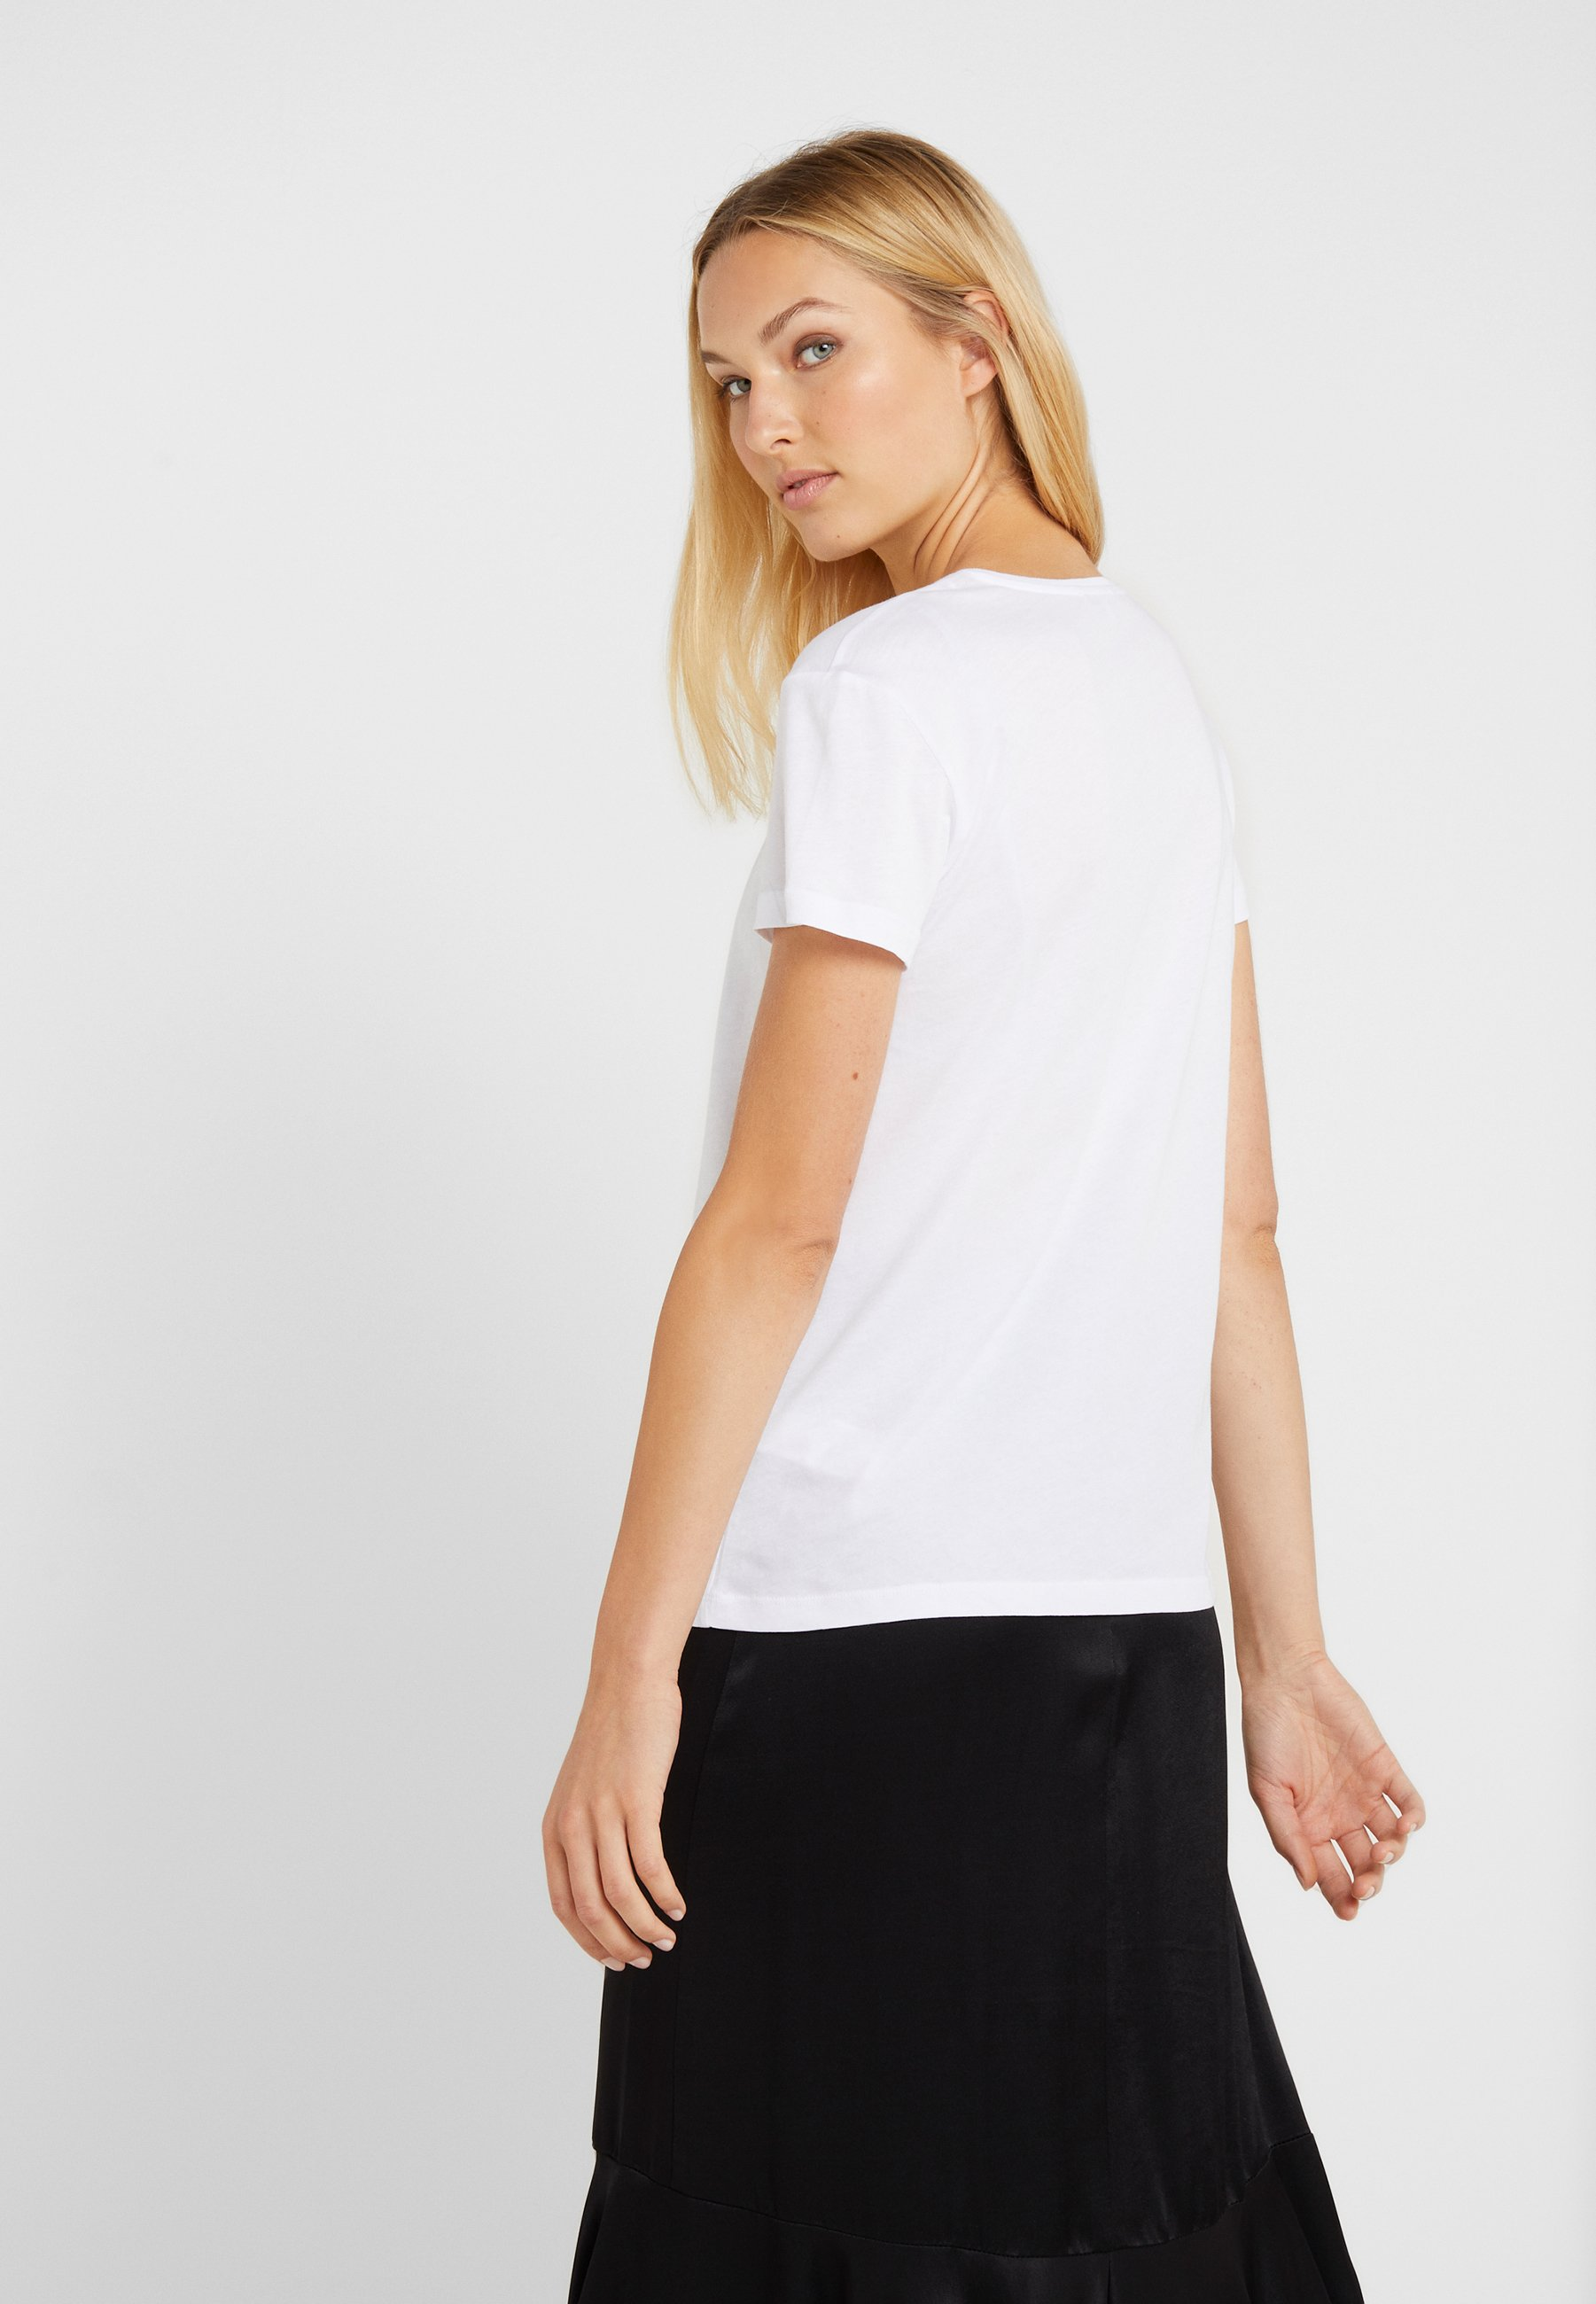 MagliaT Patrizia Bianco Pepe Imprimé shirt PXTkZOui